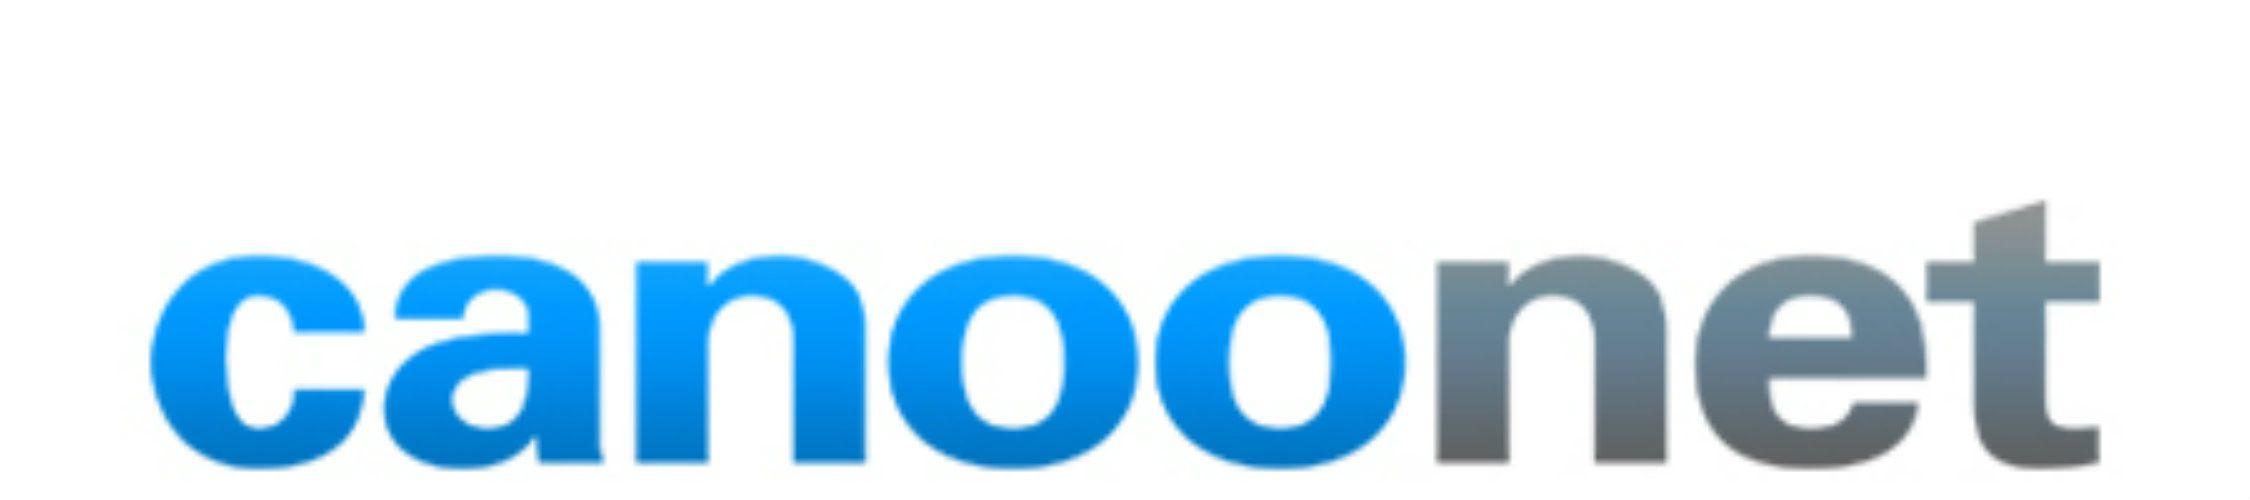 Canoo.net logo